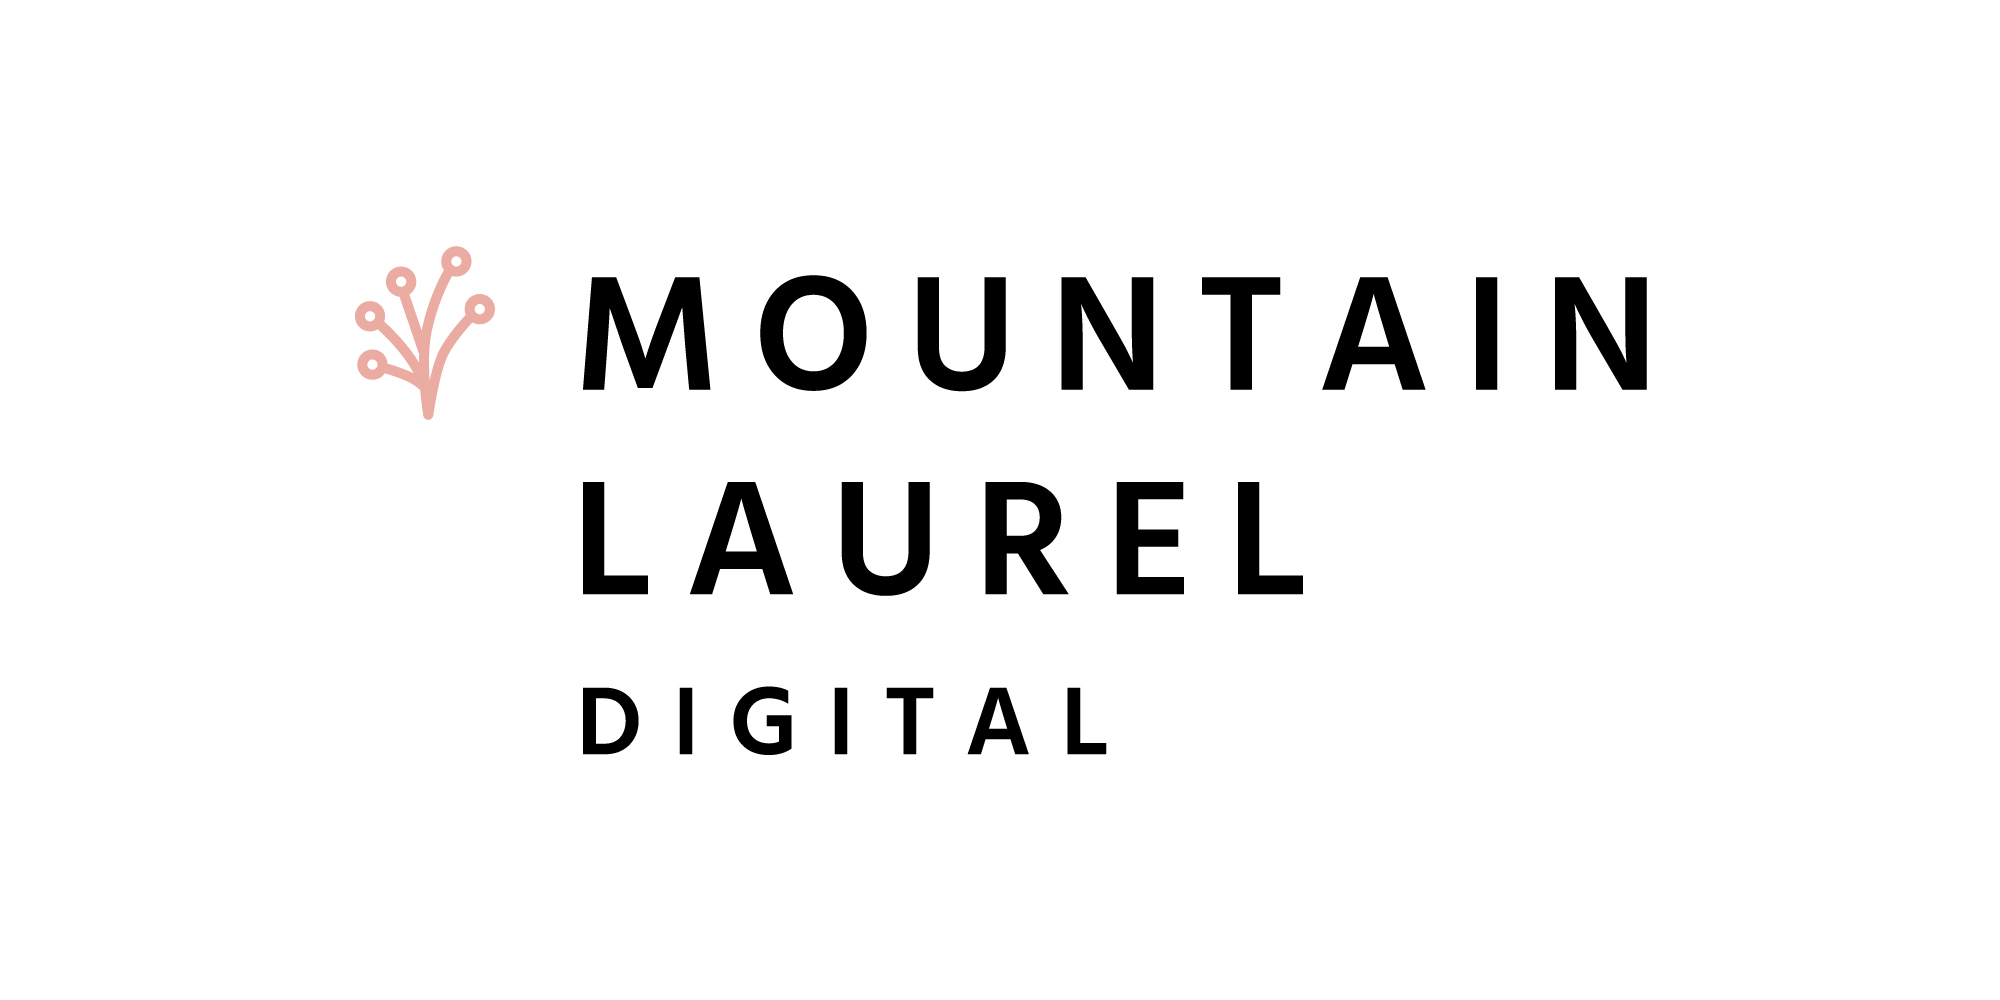 MountainLaurelDigitalLogo.jpg